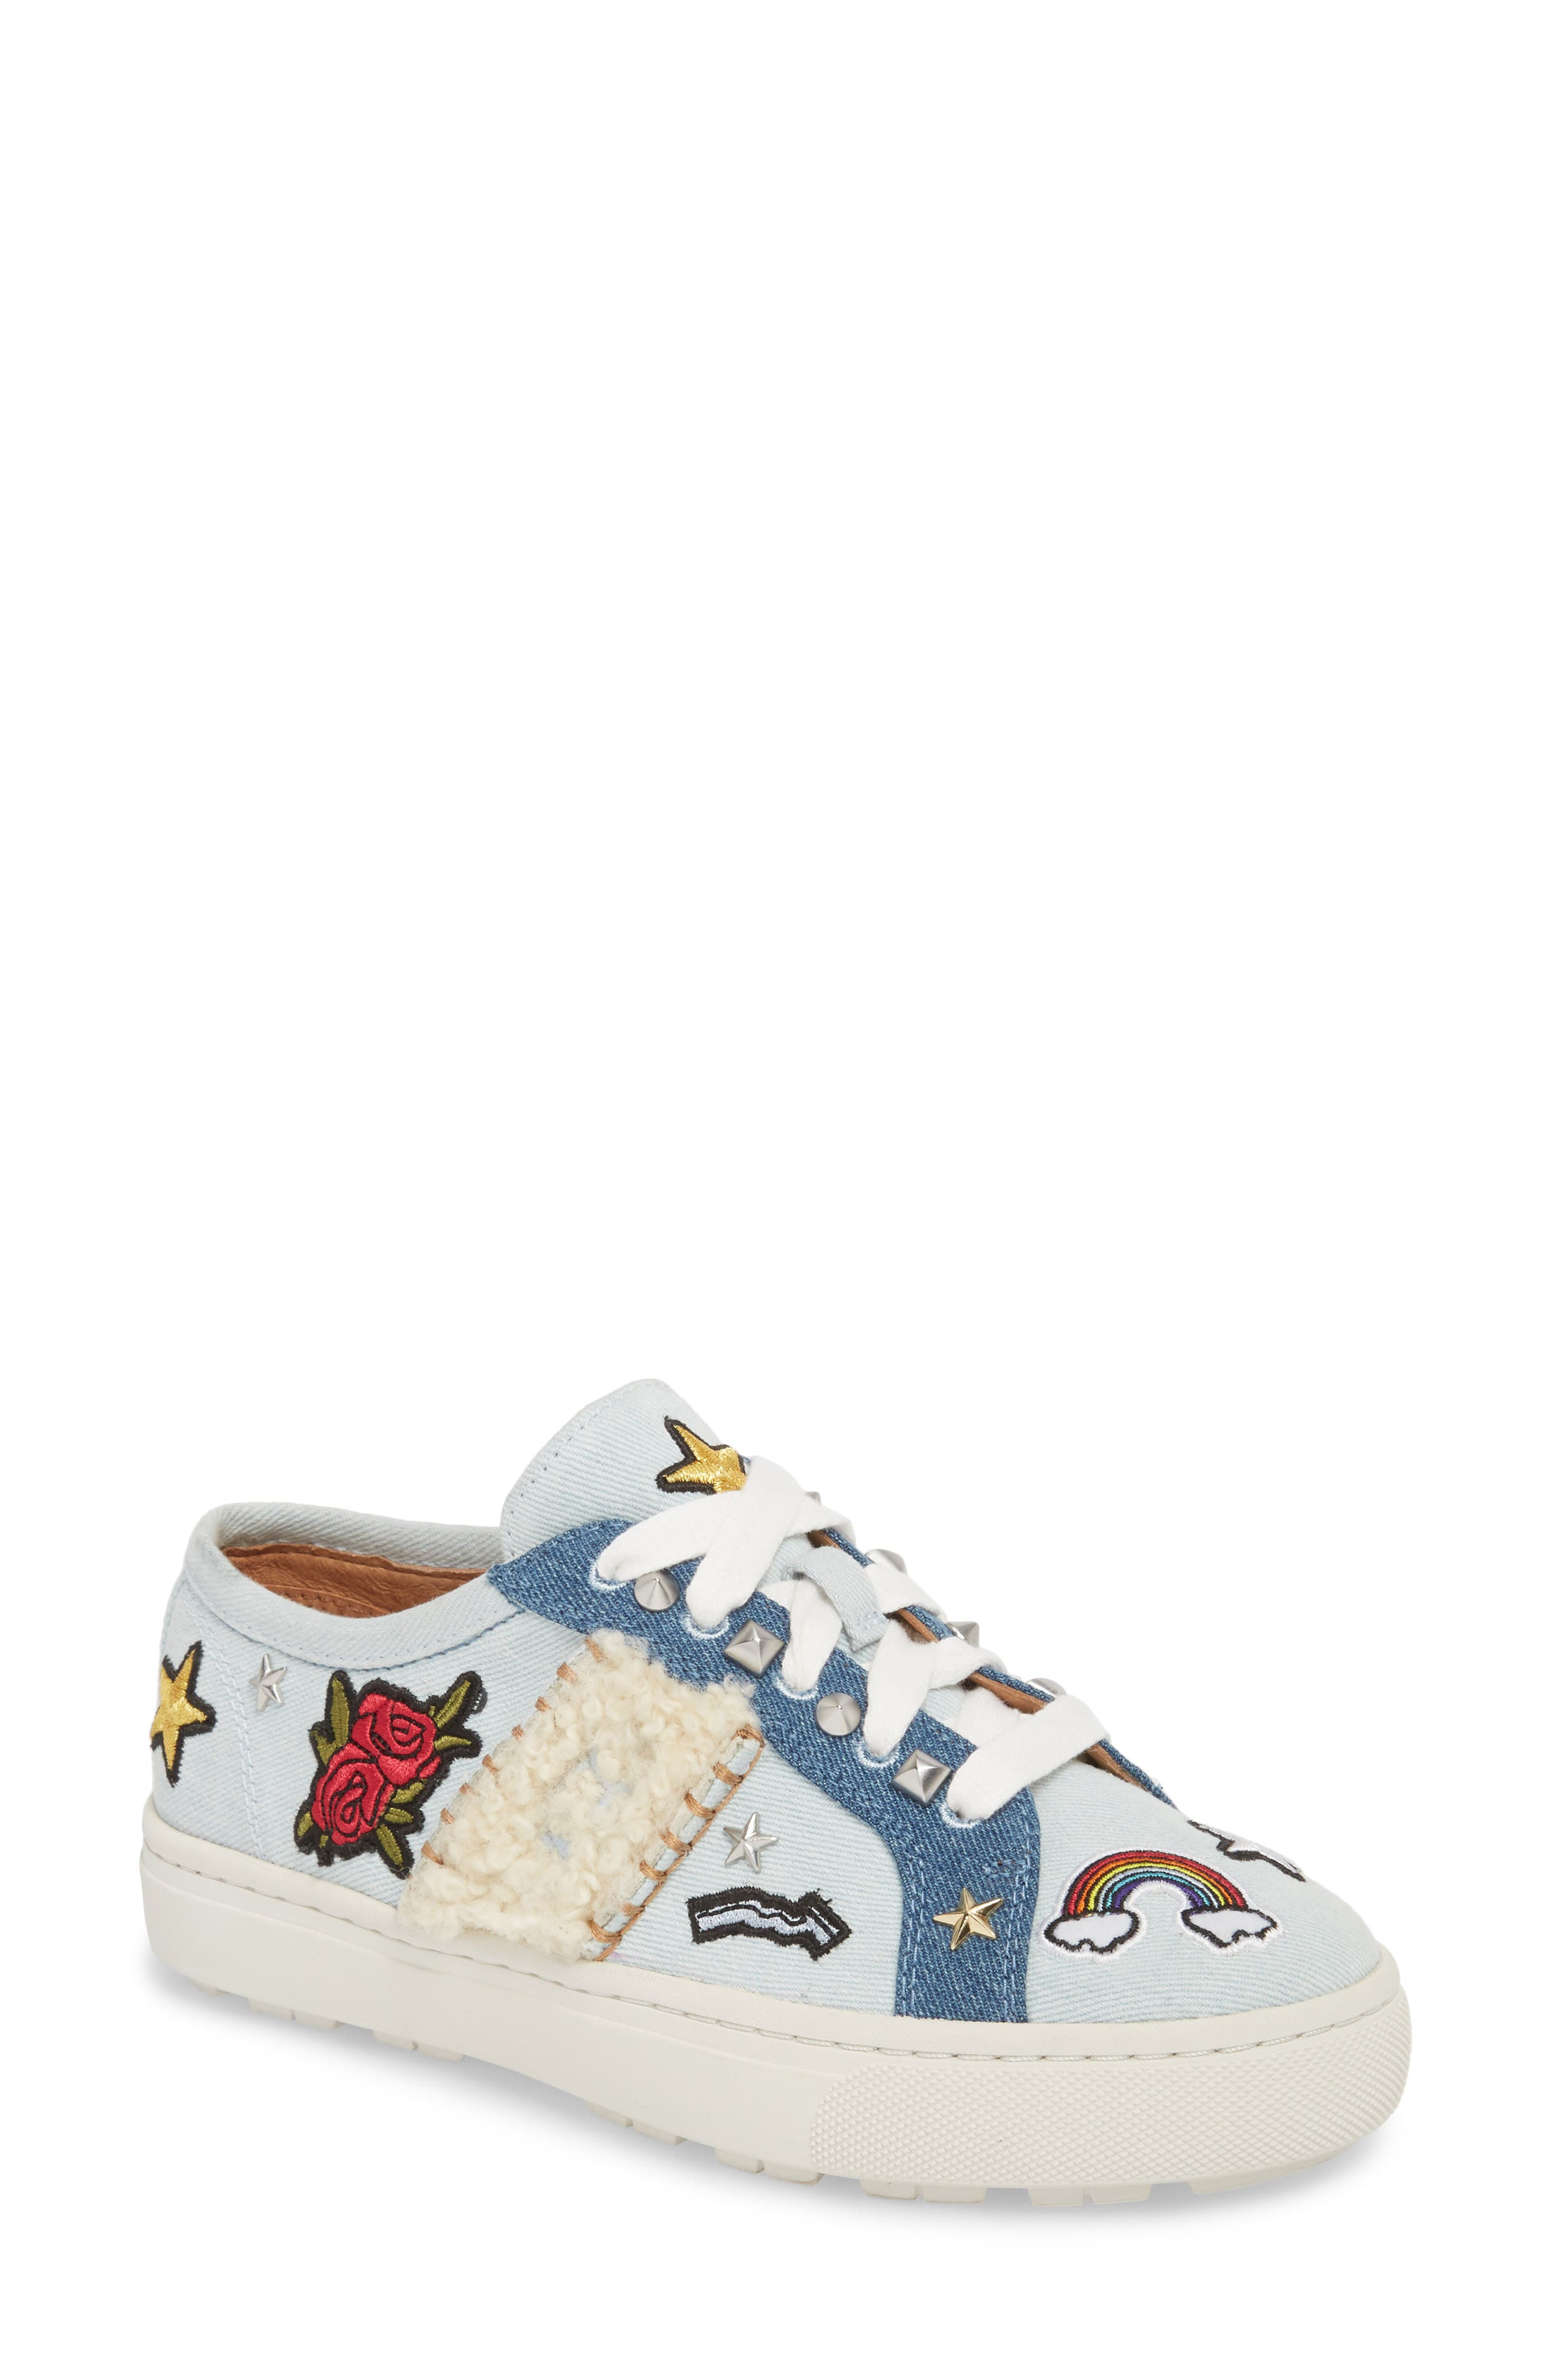 Patch It Genuine Shearling Trim Sneaker,                             Main thumbnail 1, color,                             452